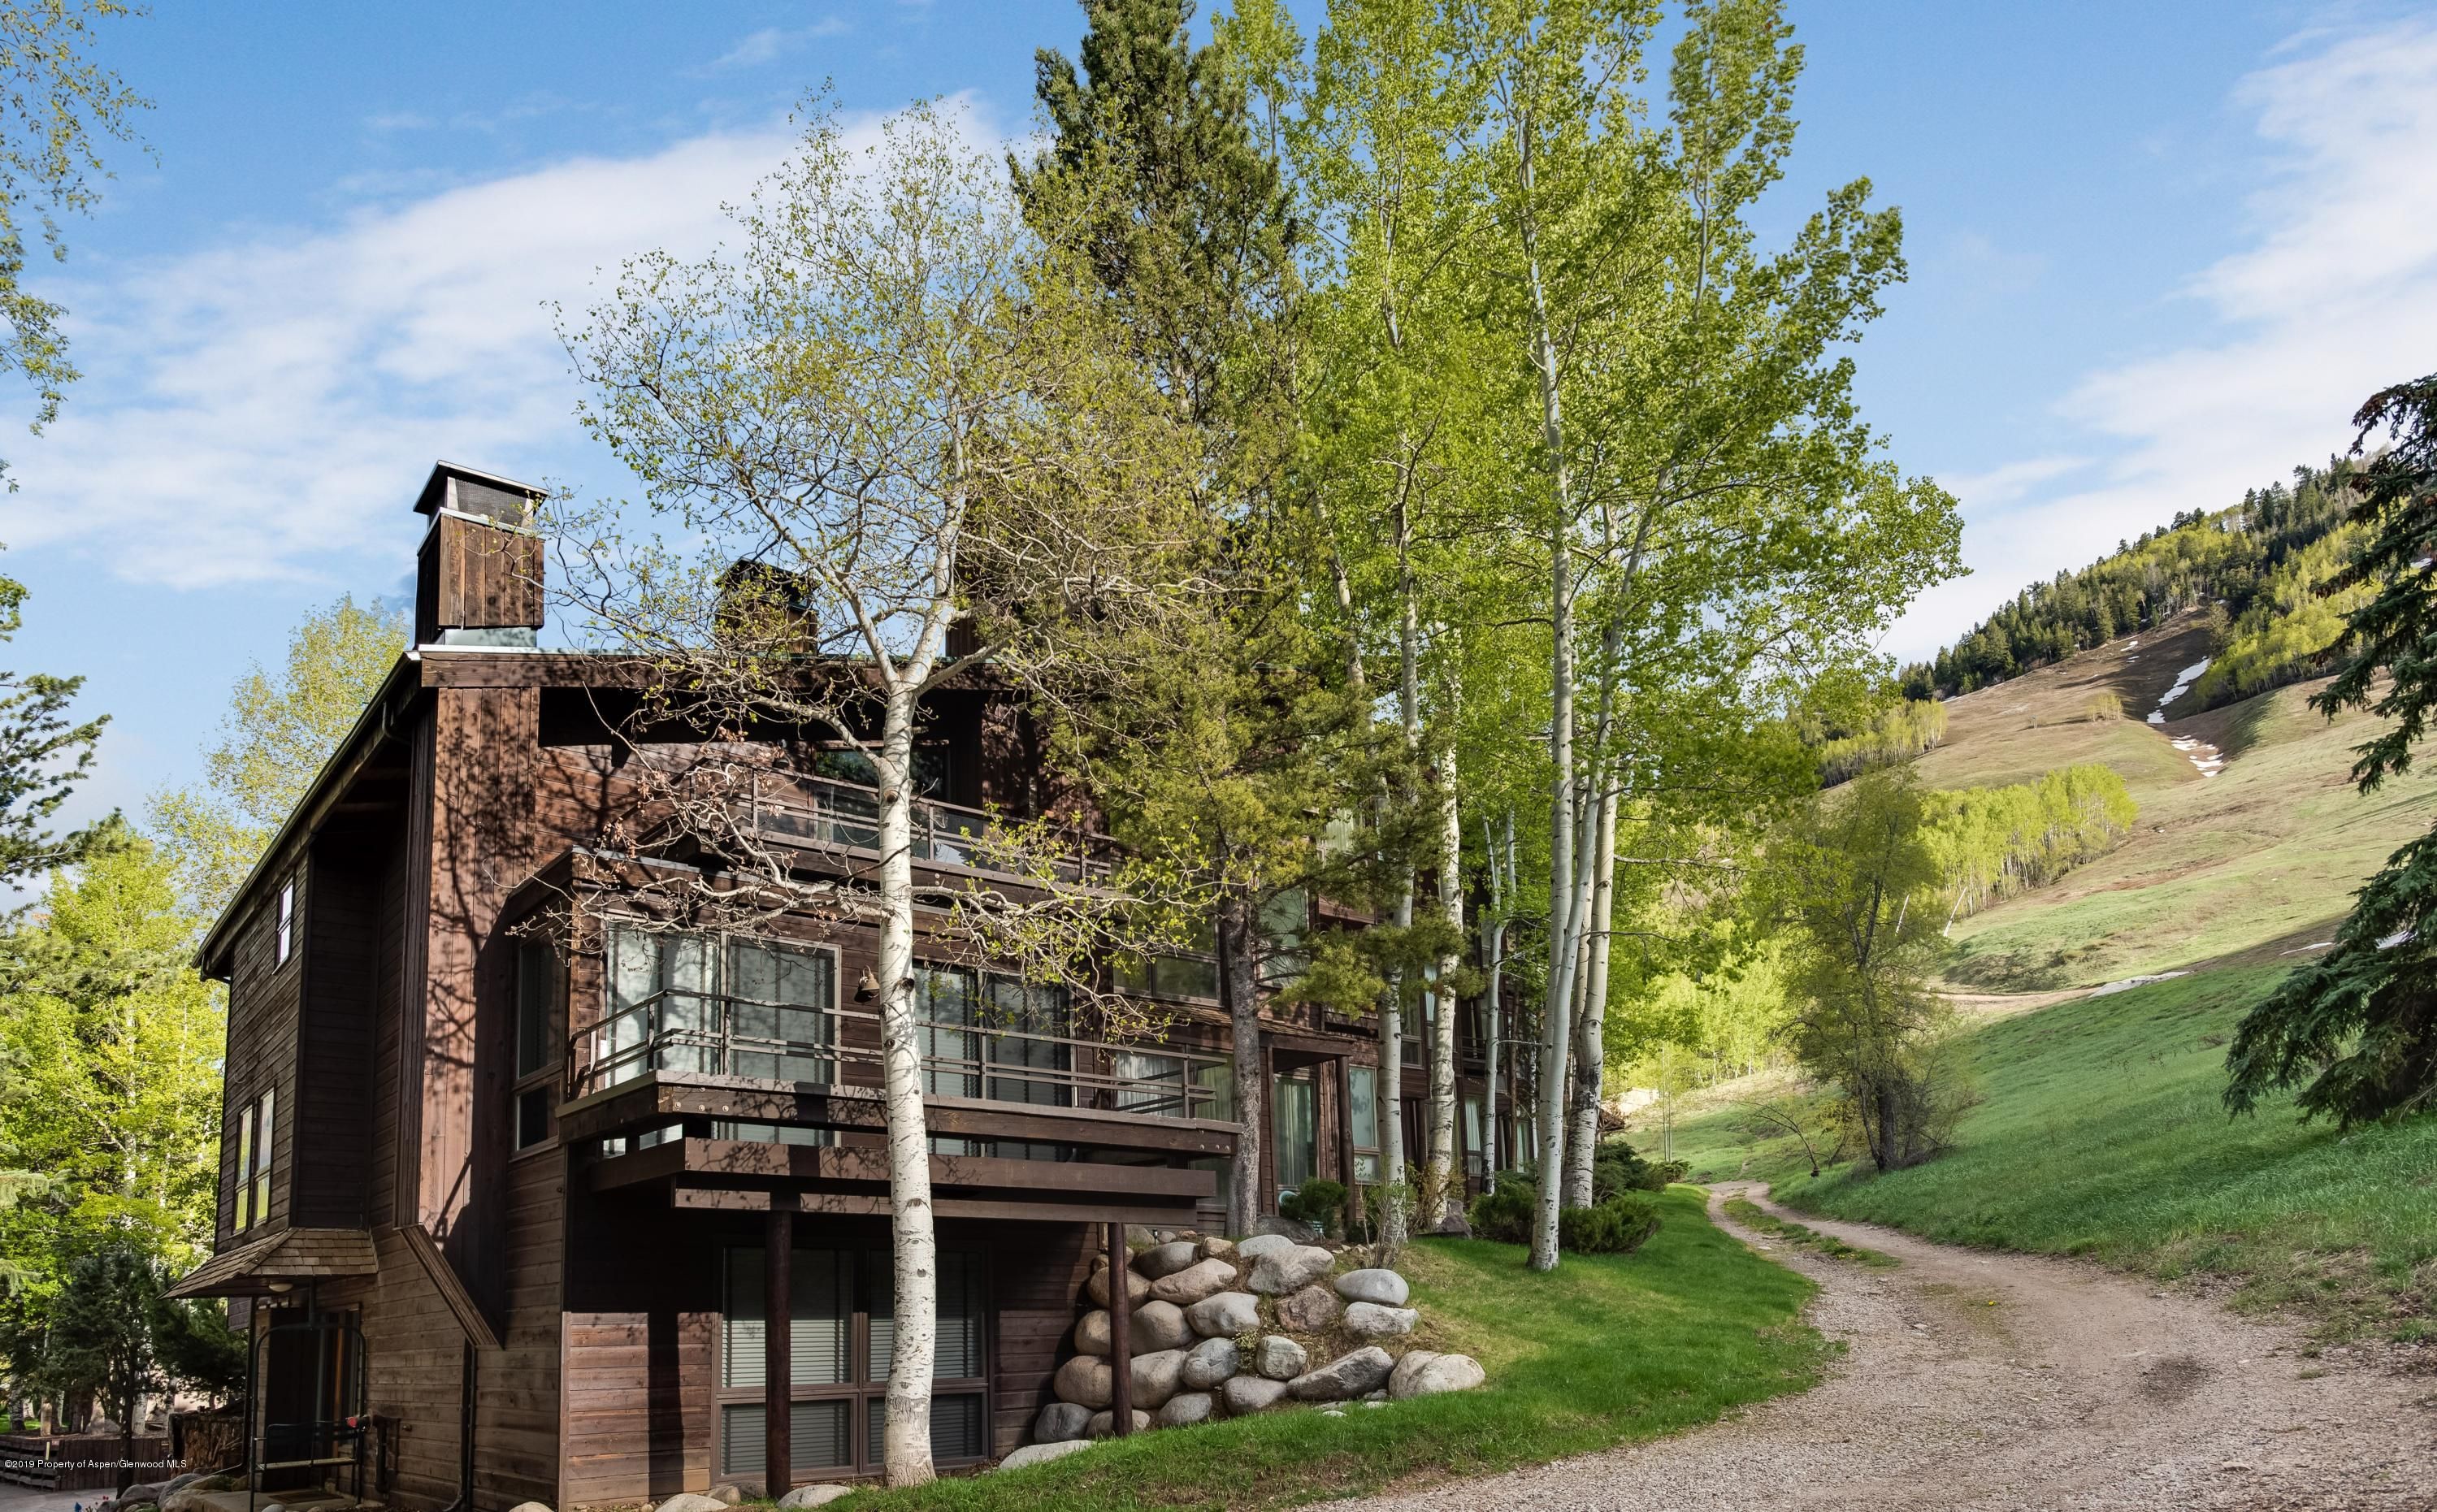 800 S Monarch Street, #15 - Aspen, Colorado